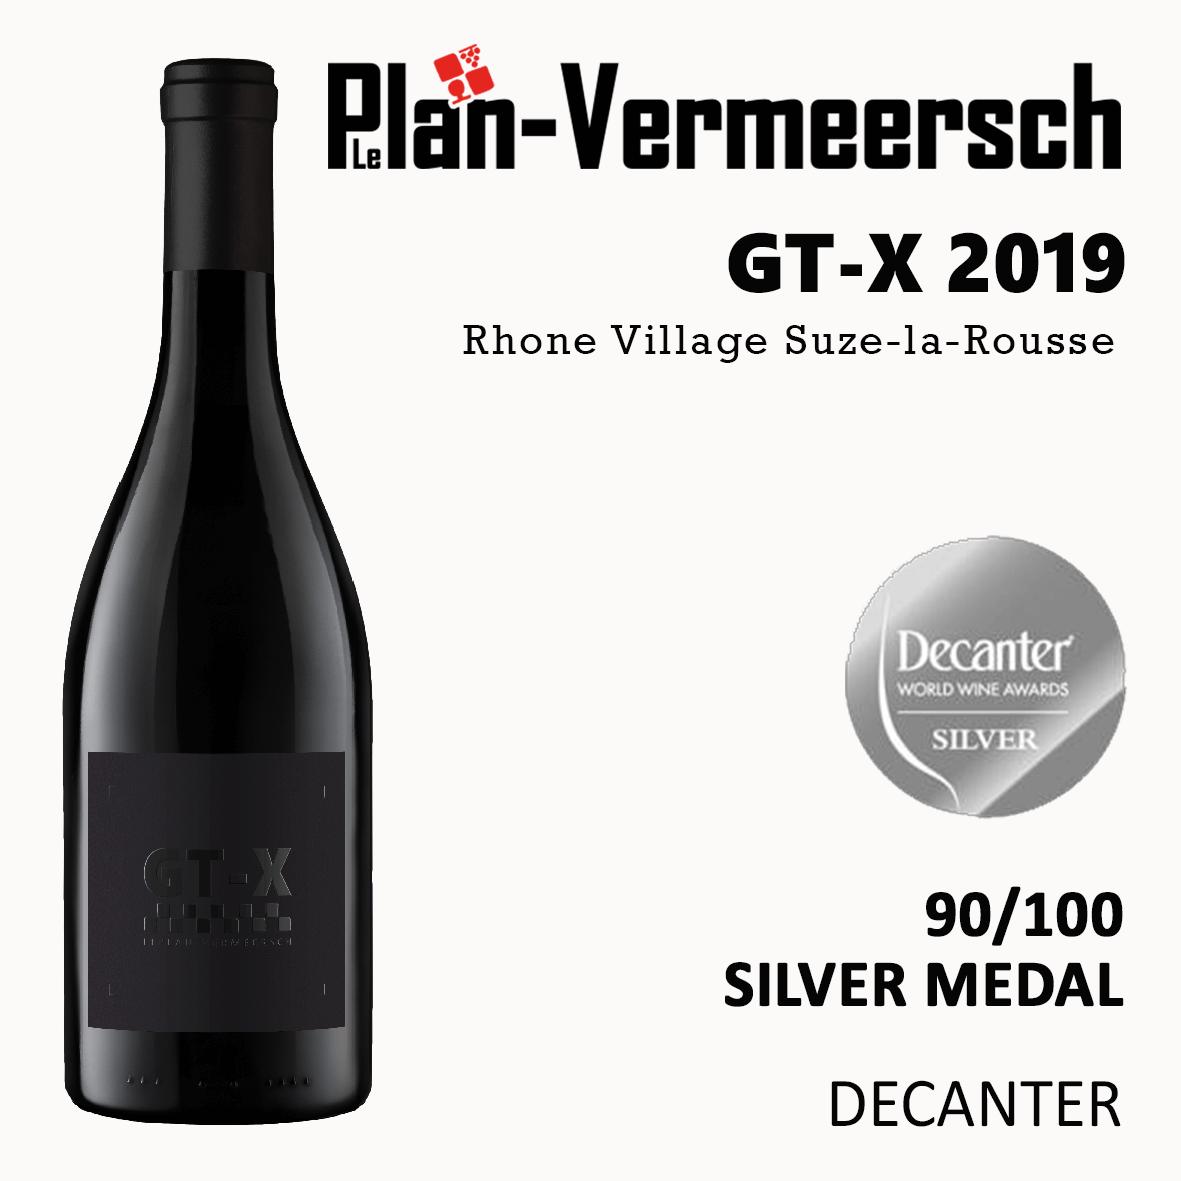 Bottle blend Grenache Syrah Carignan Mourvèdre Viognier GT-X wine silver medal Decanter LePlan-Vermeersch